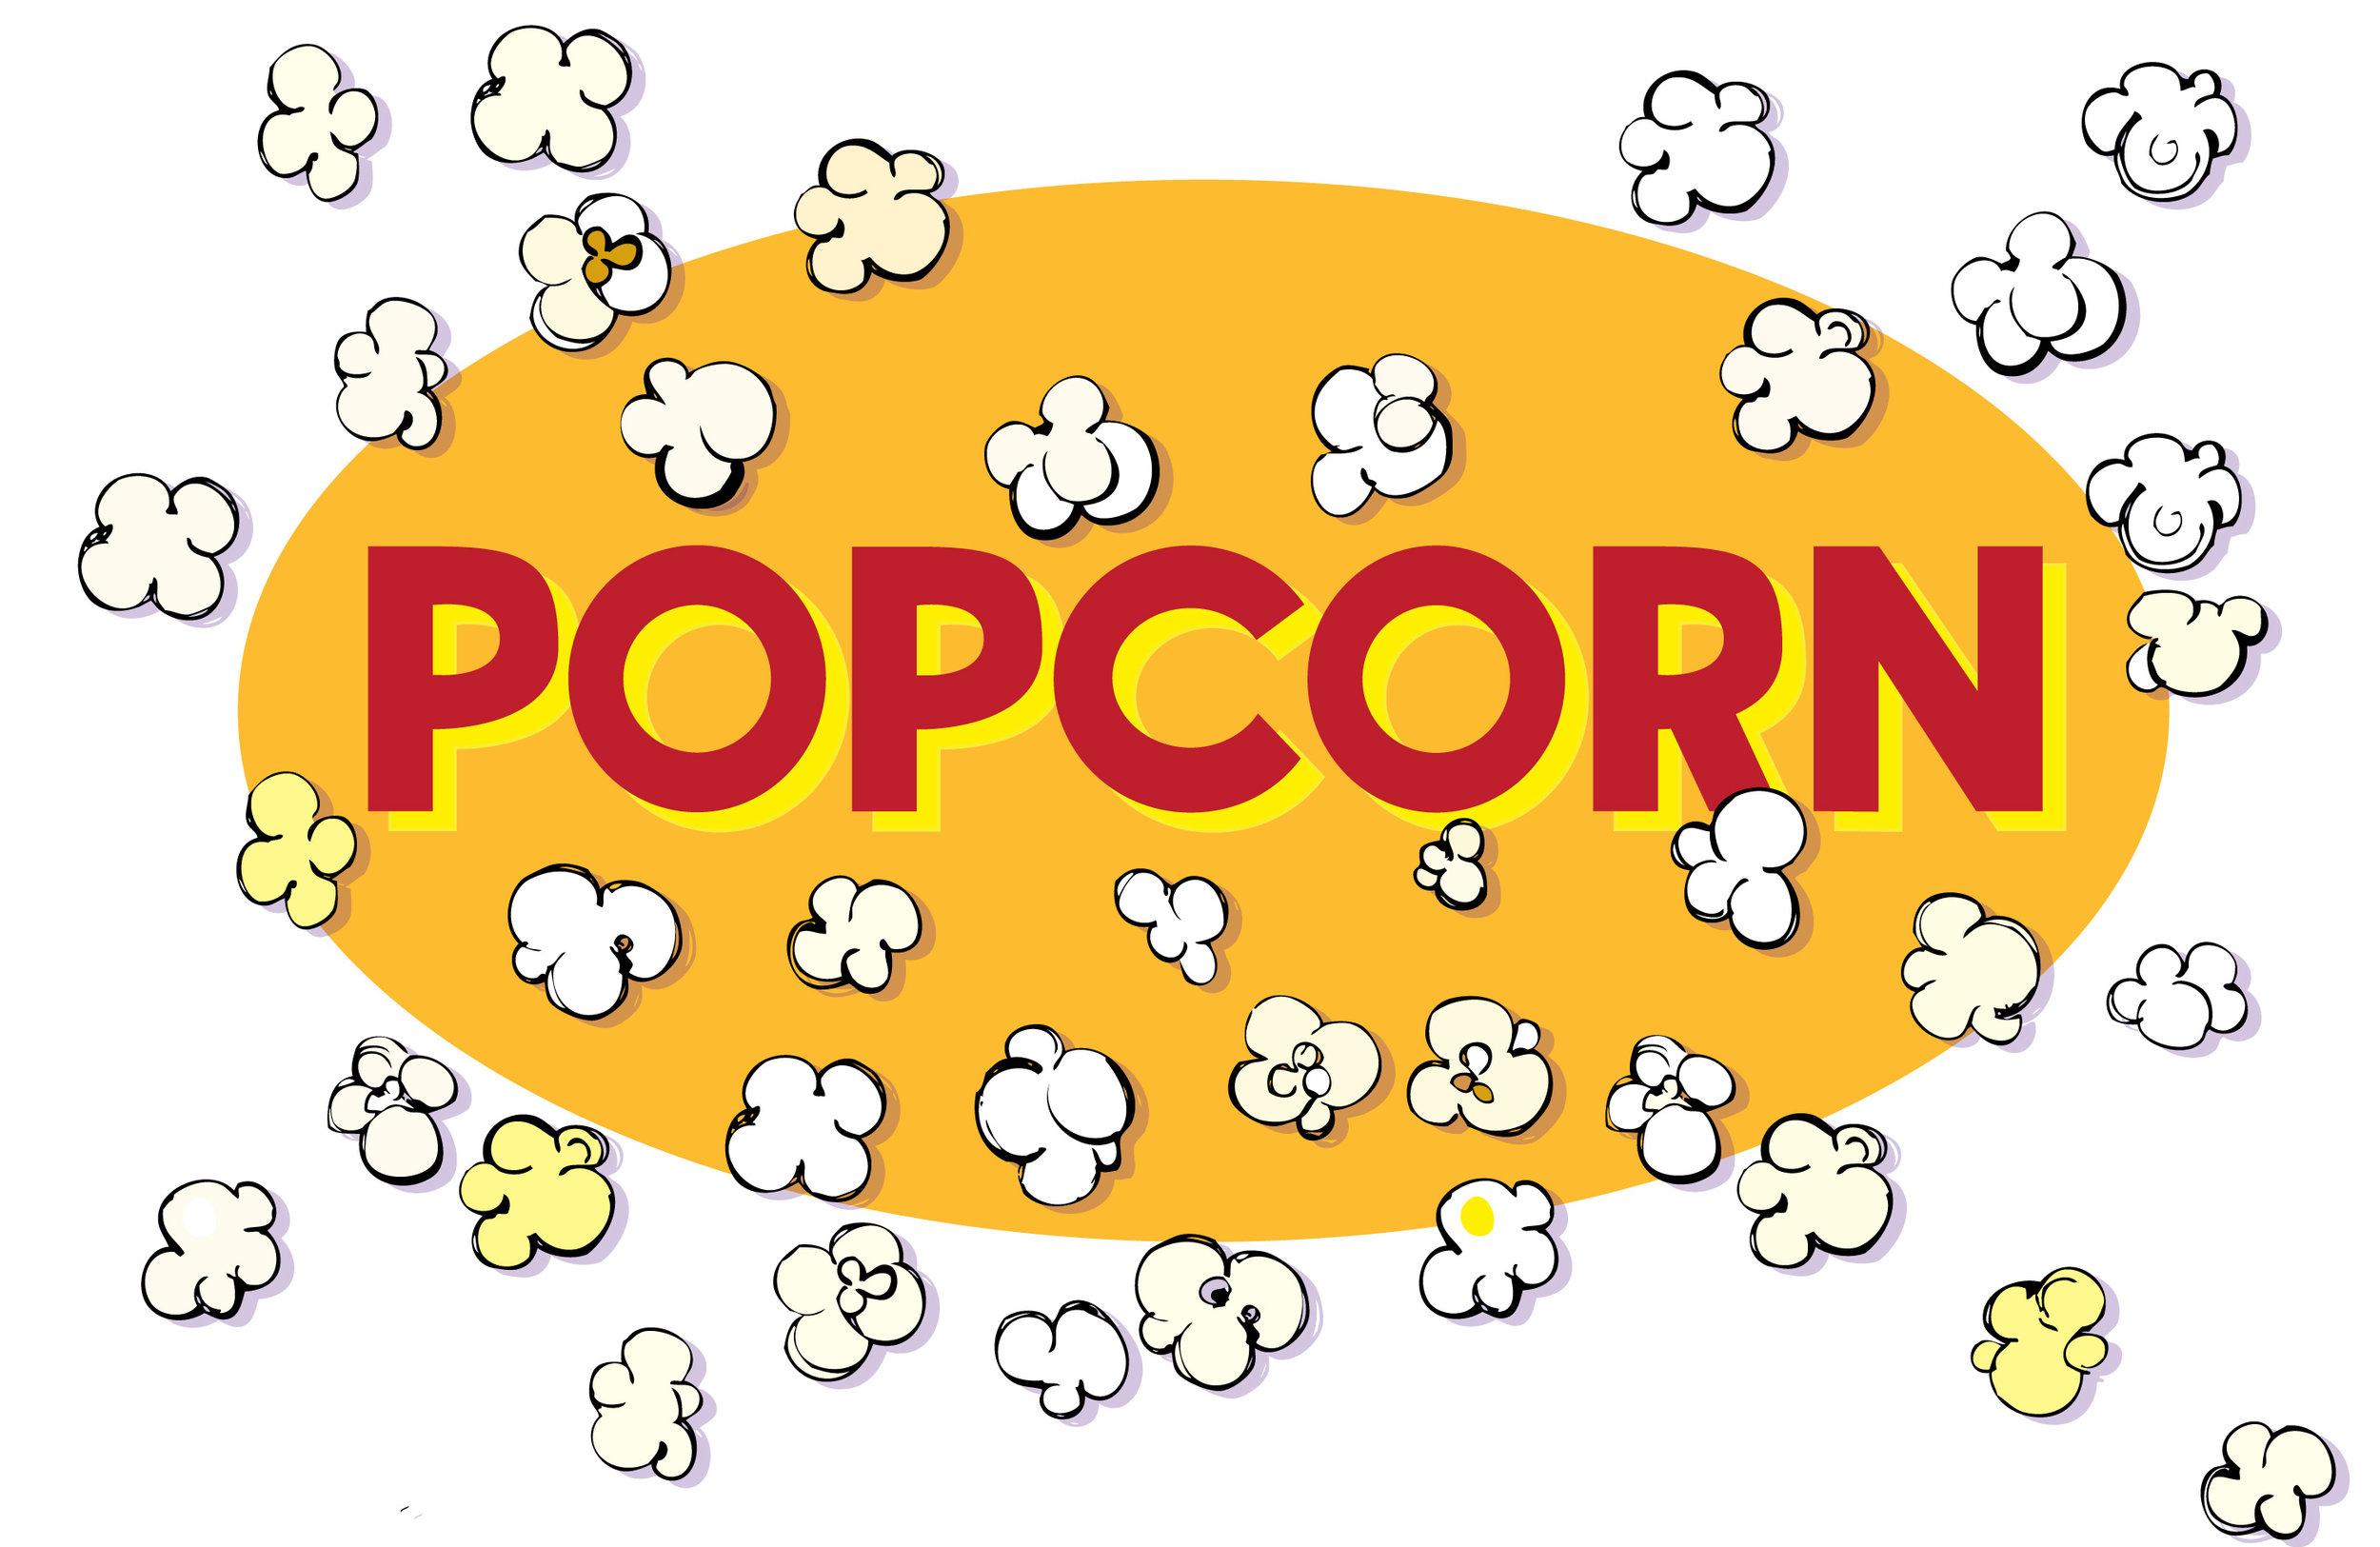 popcorn-01.jpg